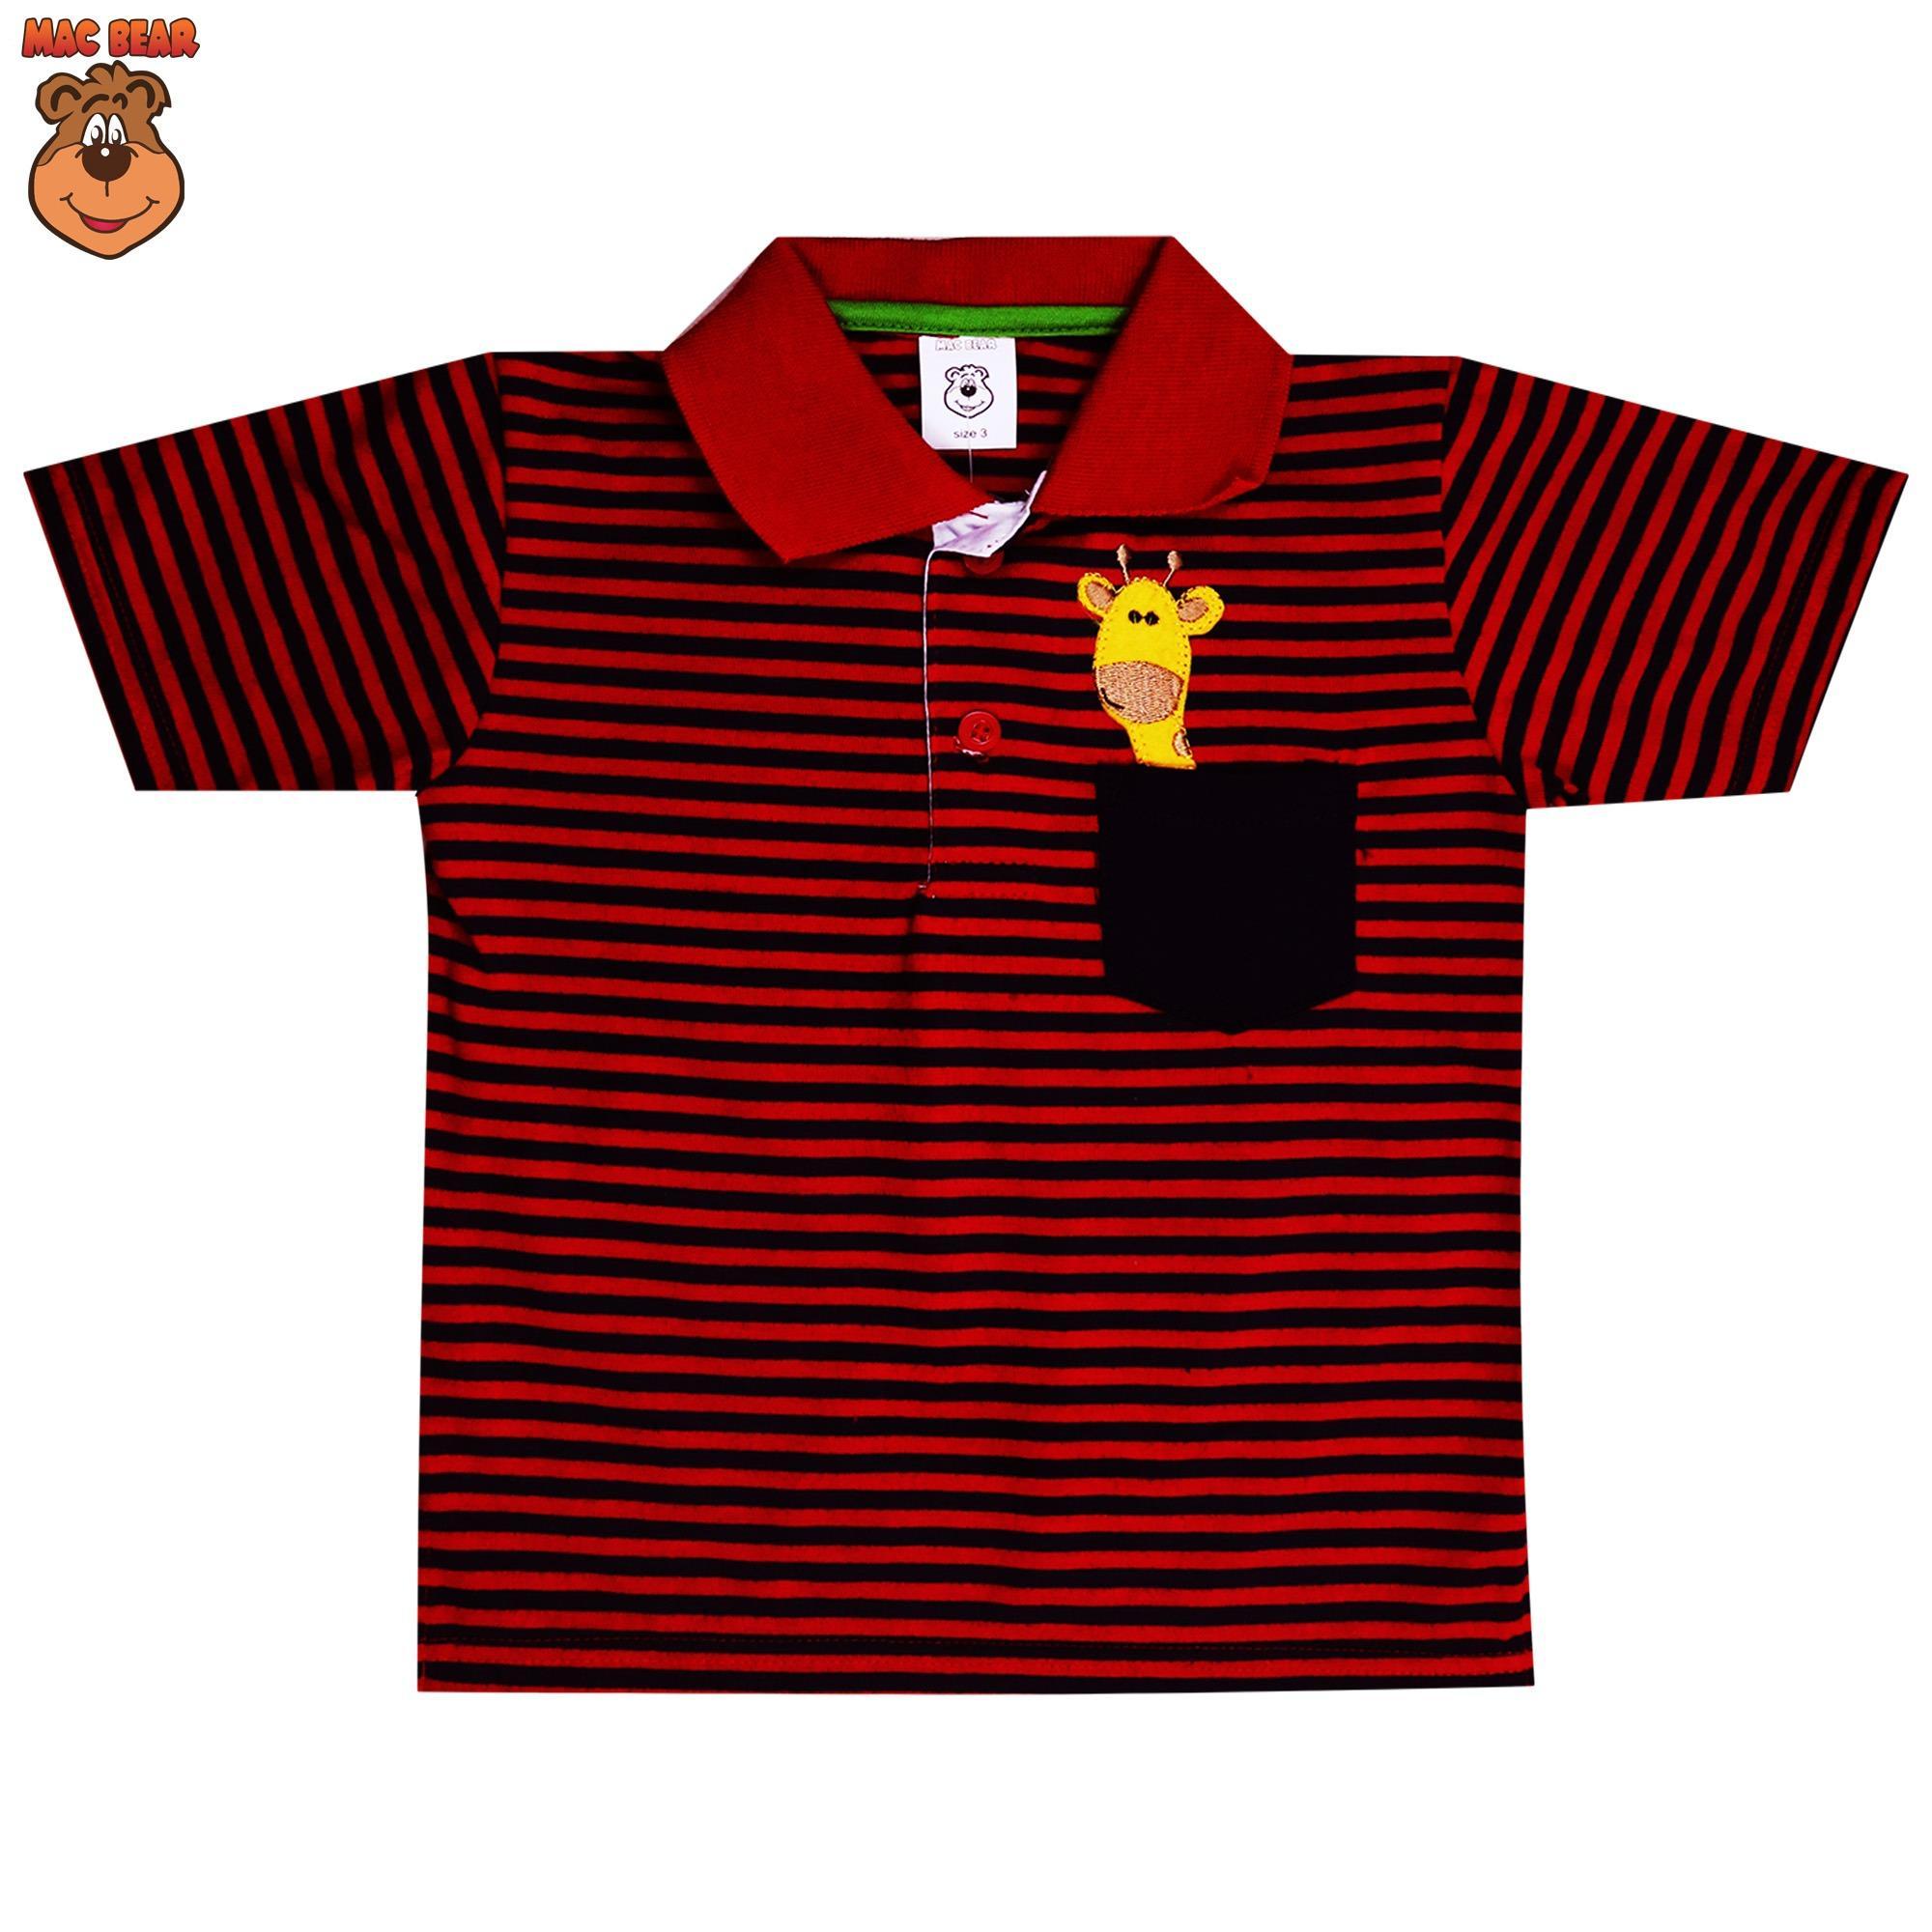 Macbear Baju Polo Anak M For White Stripes On Yellow Size 5 Ae3 1801 Kids Setelan Piyama Little Astronout Hijau Tua Cool Red Source Atasan